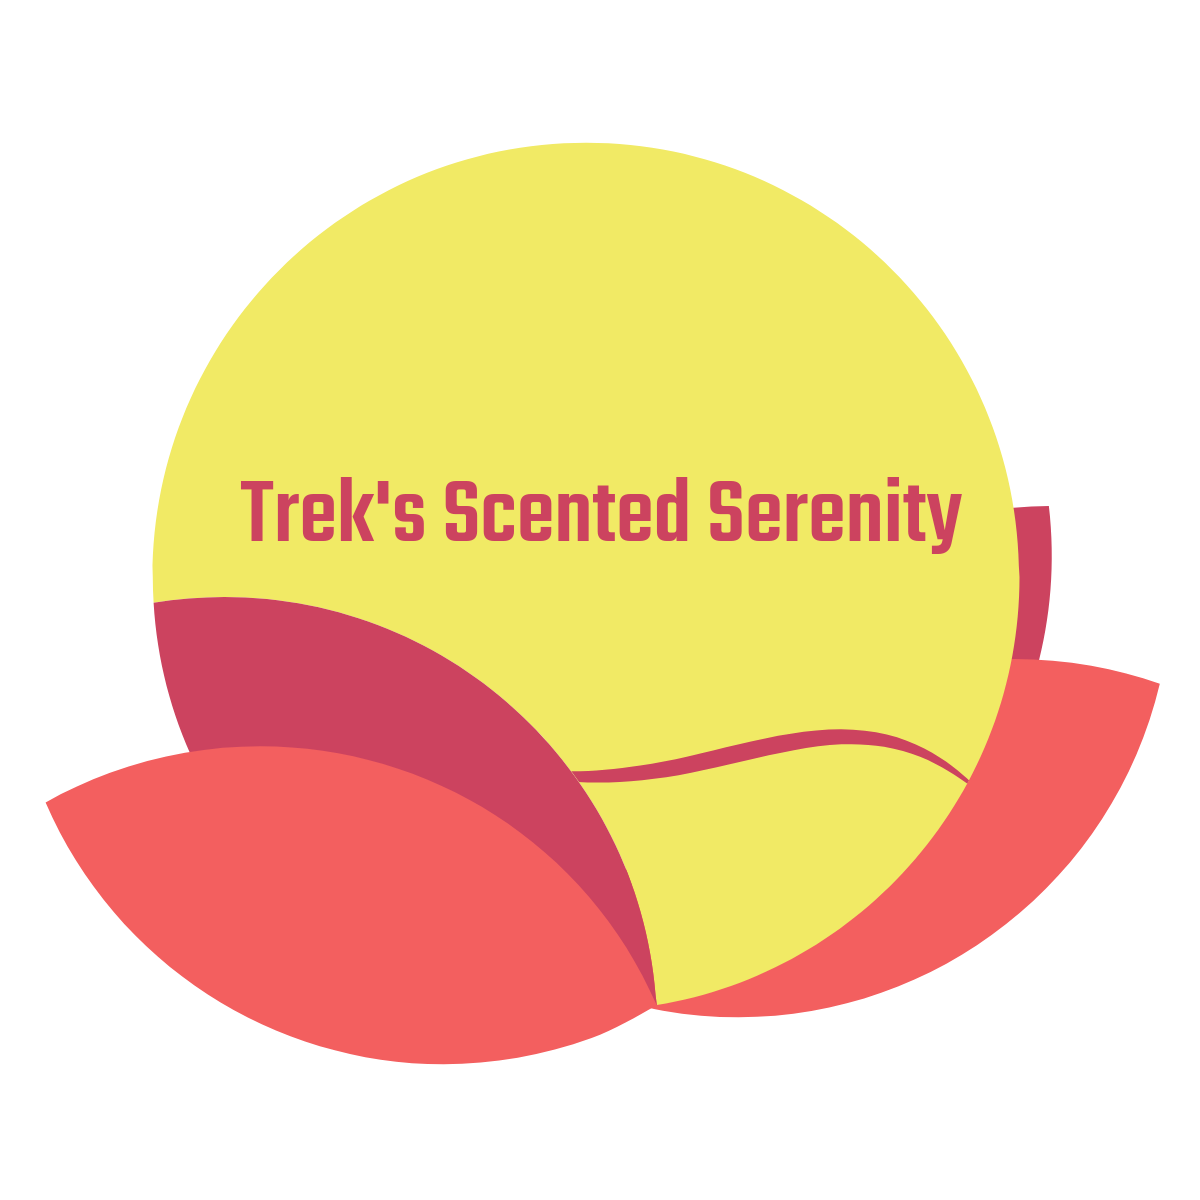 Trek's Scented Serenity primary image